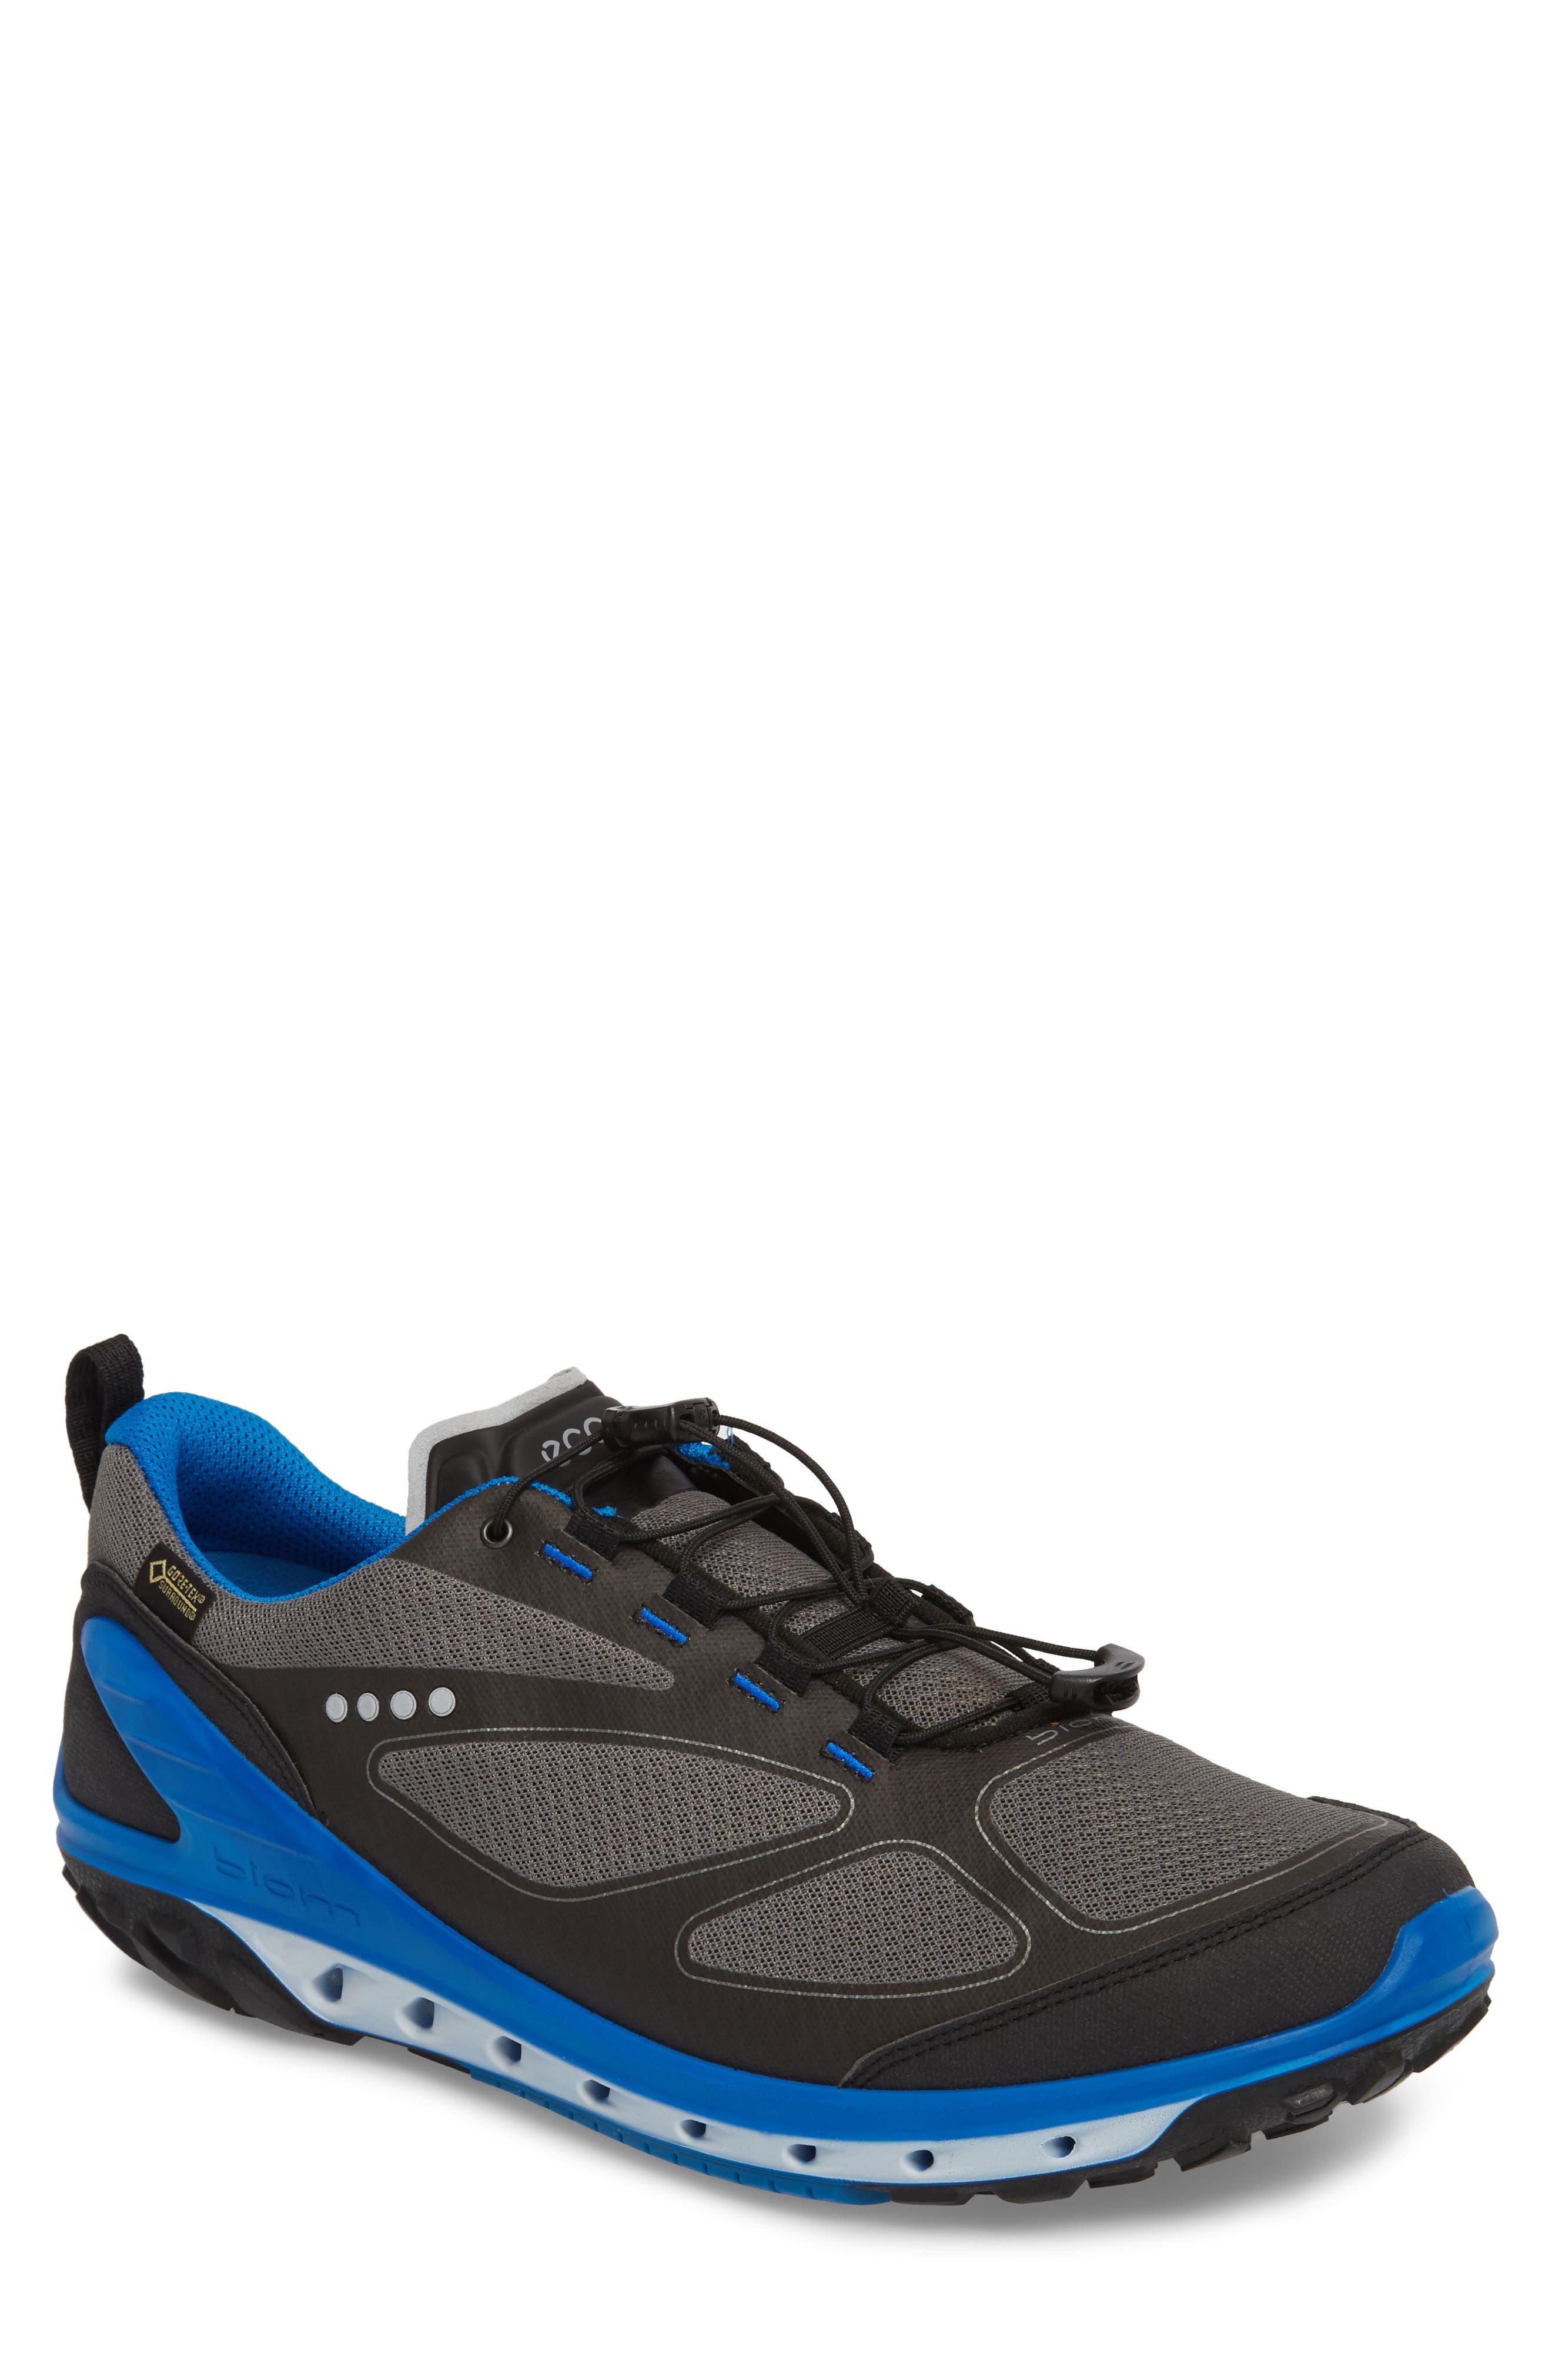 BIOM Venture GTX Sneaker,                         Main,                         color, 062